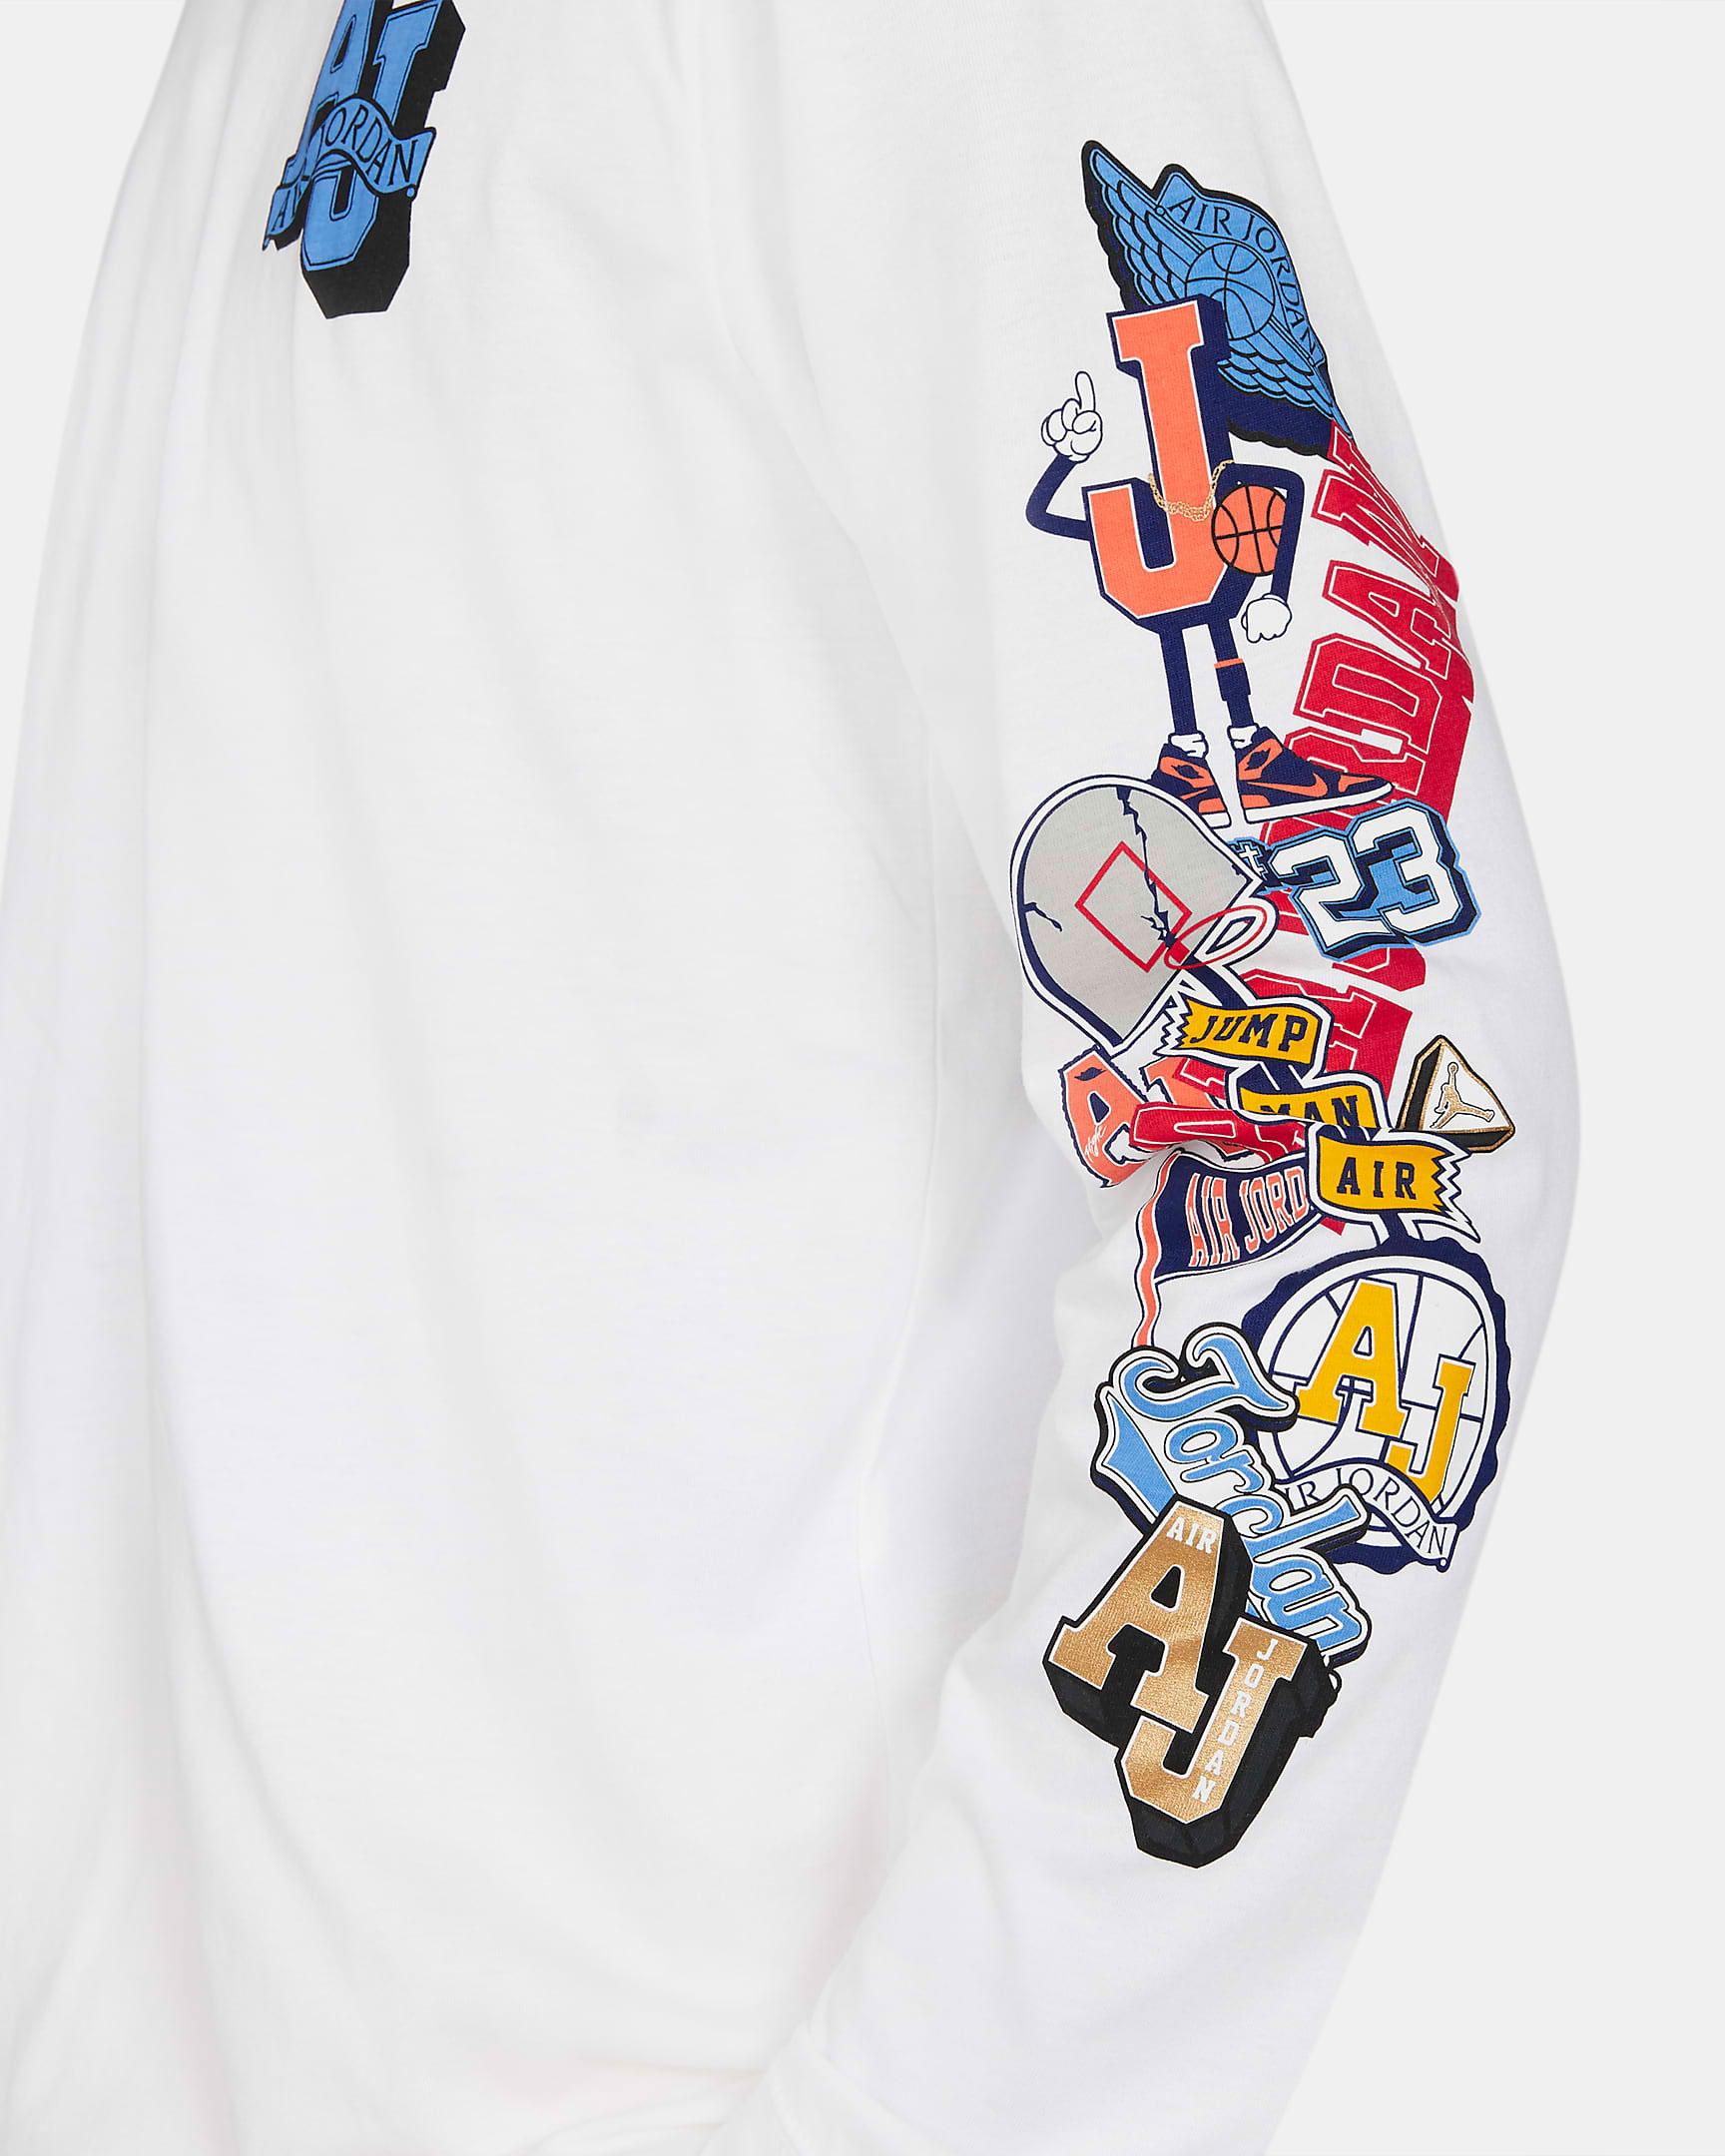 jordan-white-university-blue-varsity-long-sleeve-shirt-3